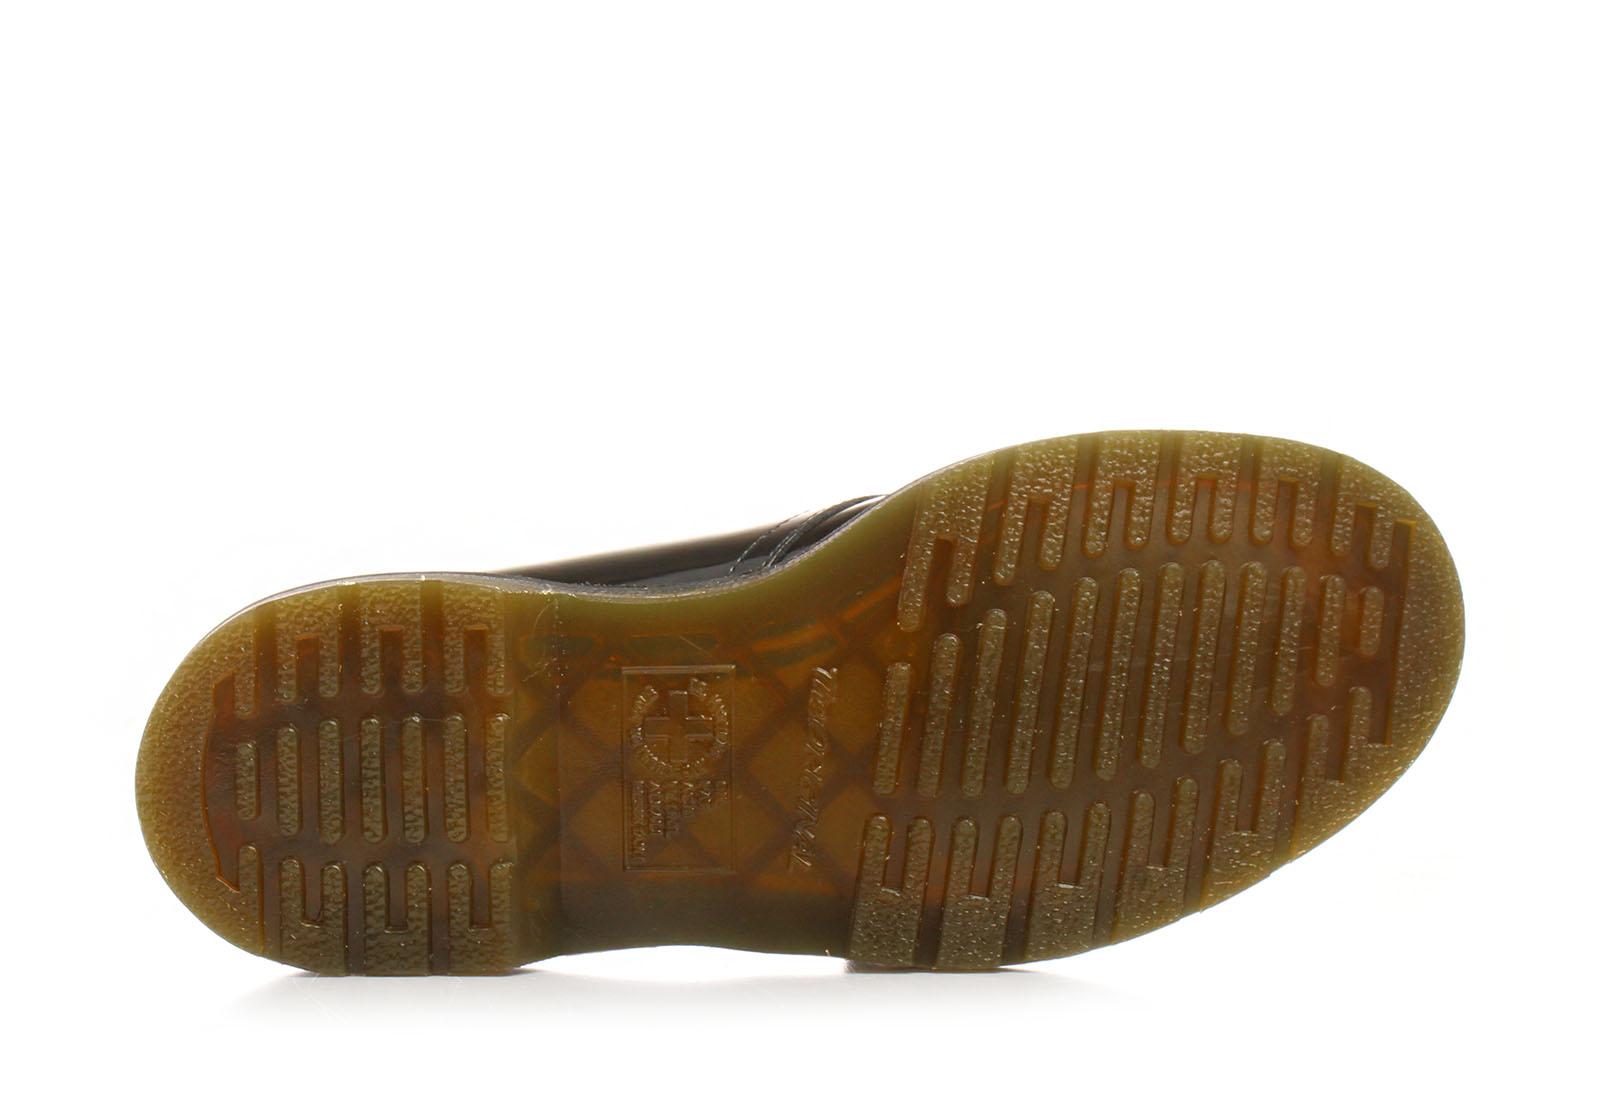 b89d6f5b5b Dr Martens Bakancs - 1461 - DM10084001 - Office Shoes Magyarország